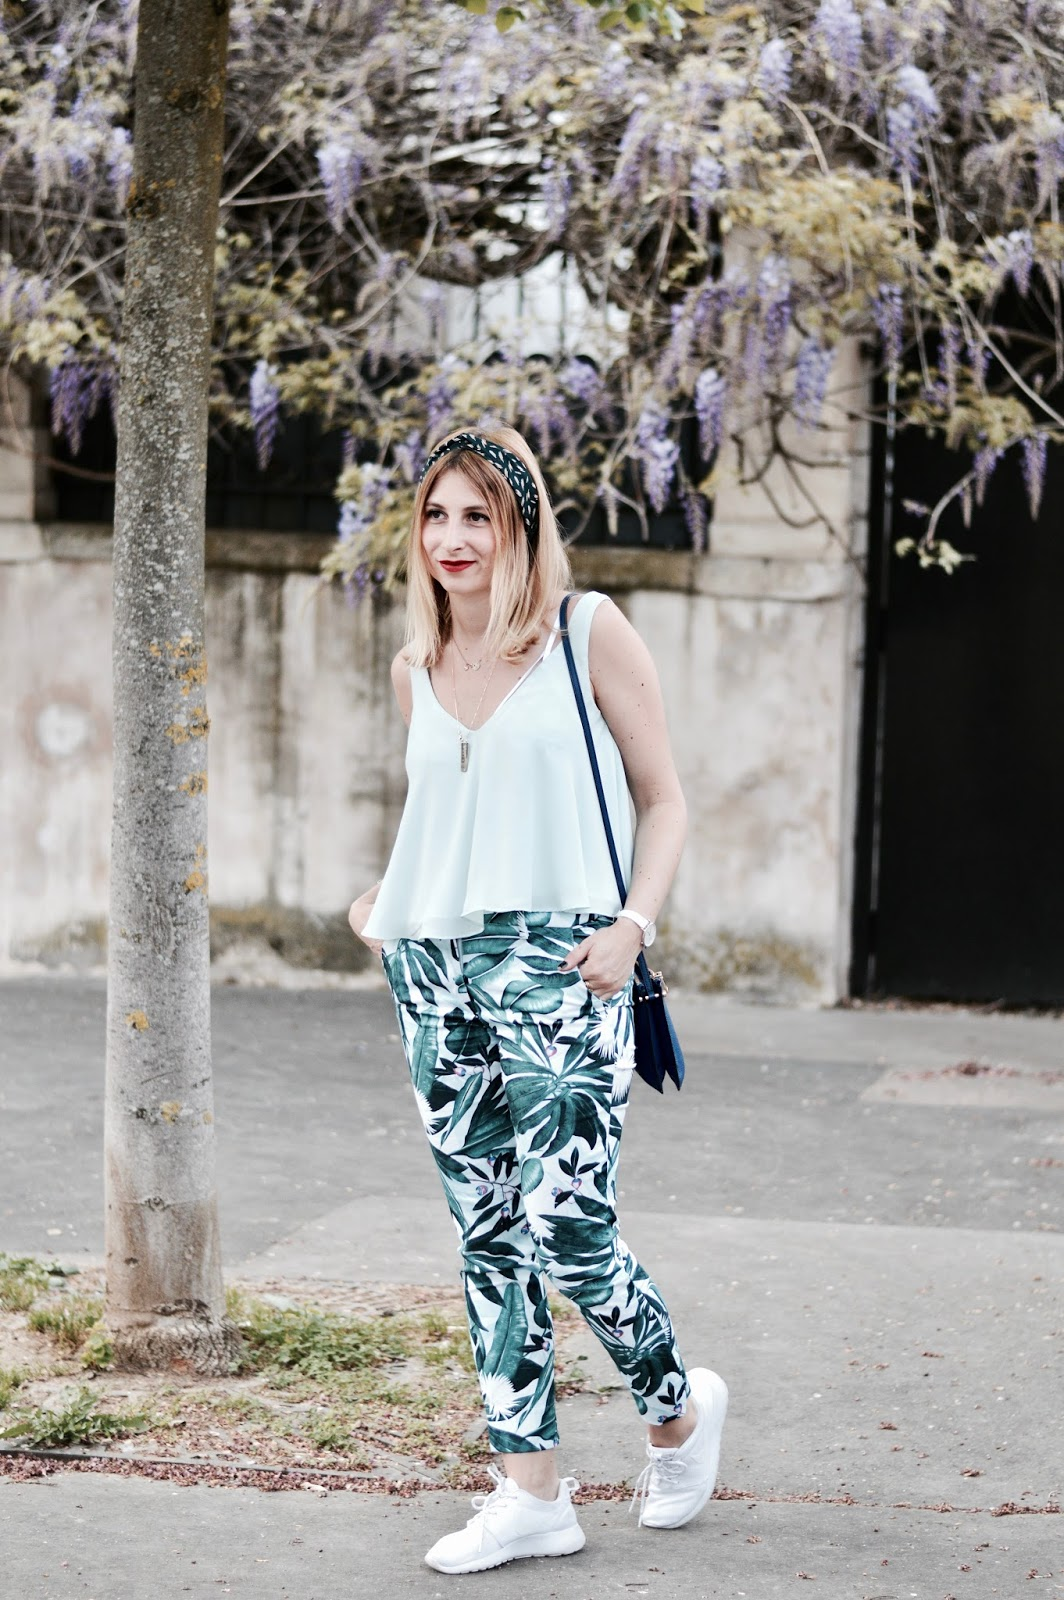 Look femme : tendance tropical